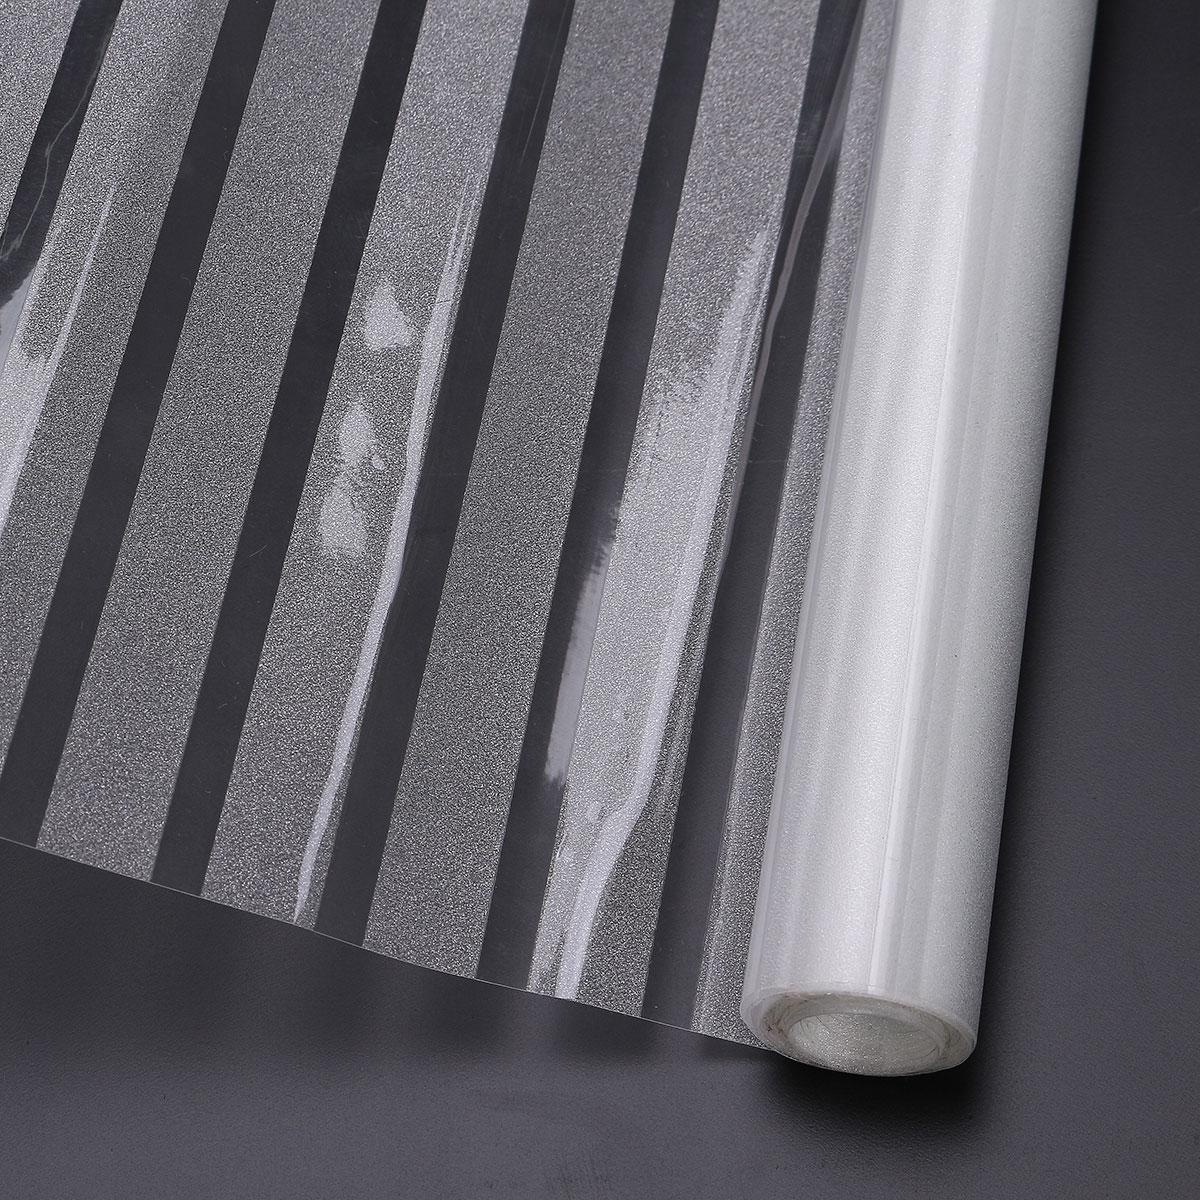 tempsa mate film autocollant sticker adh sif rayure anti vue vitre fen tre decor bureau achat. Black Bedroom Furniture Sets. Home Design Ideas